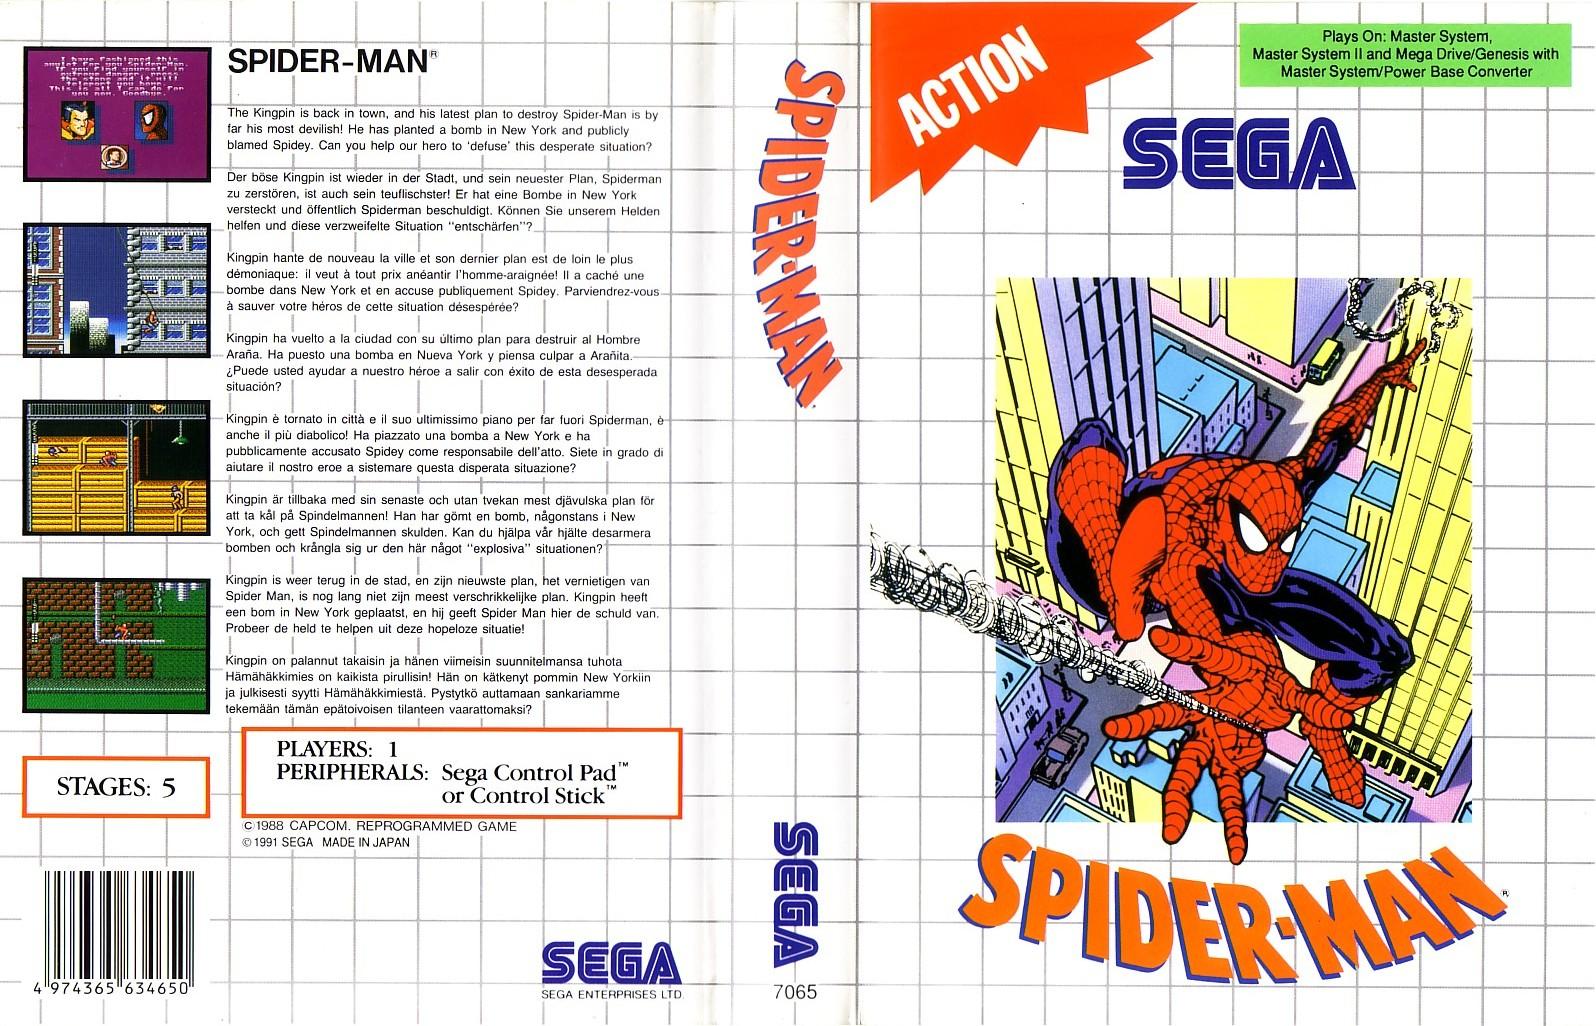 http://www.smspower.org/uploads/Scans/SpiderManVsTheKingpin-SMS-EU-Capcom.jpg